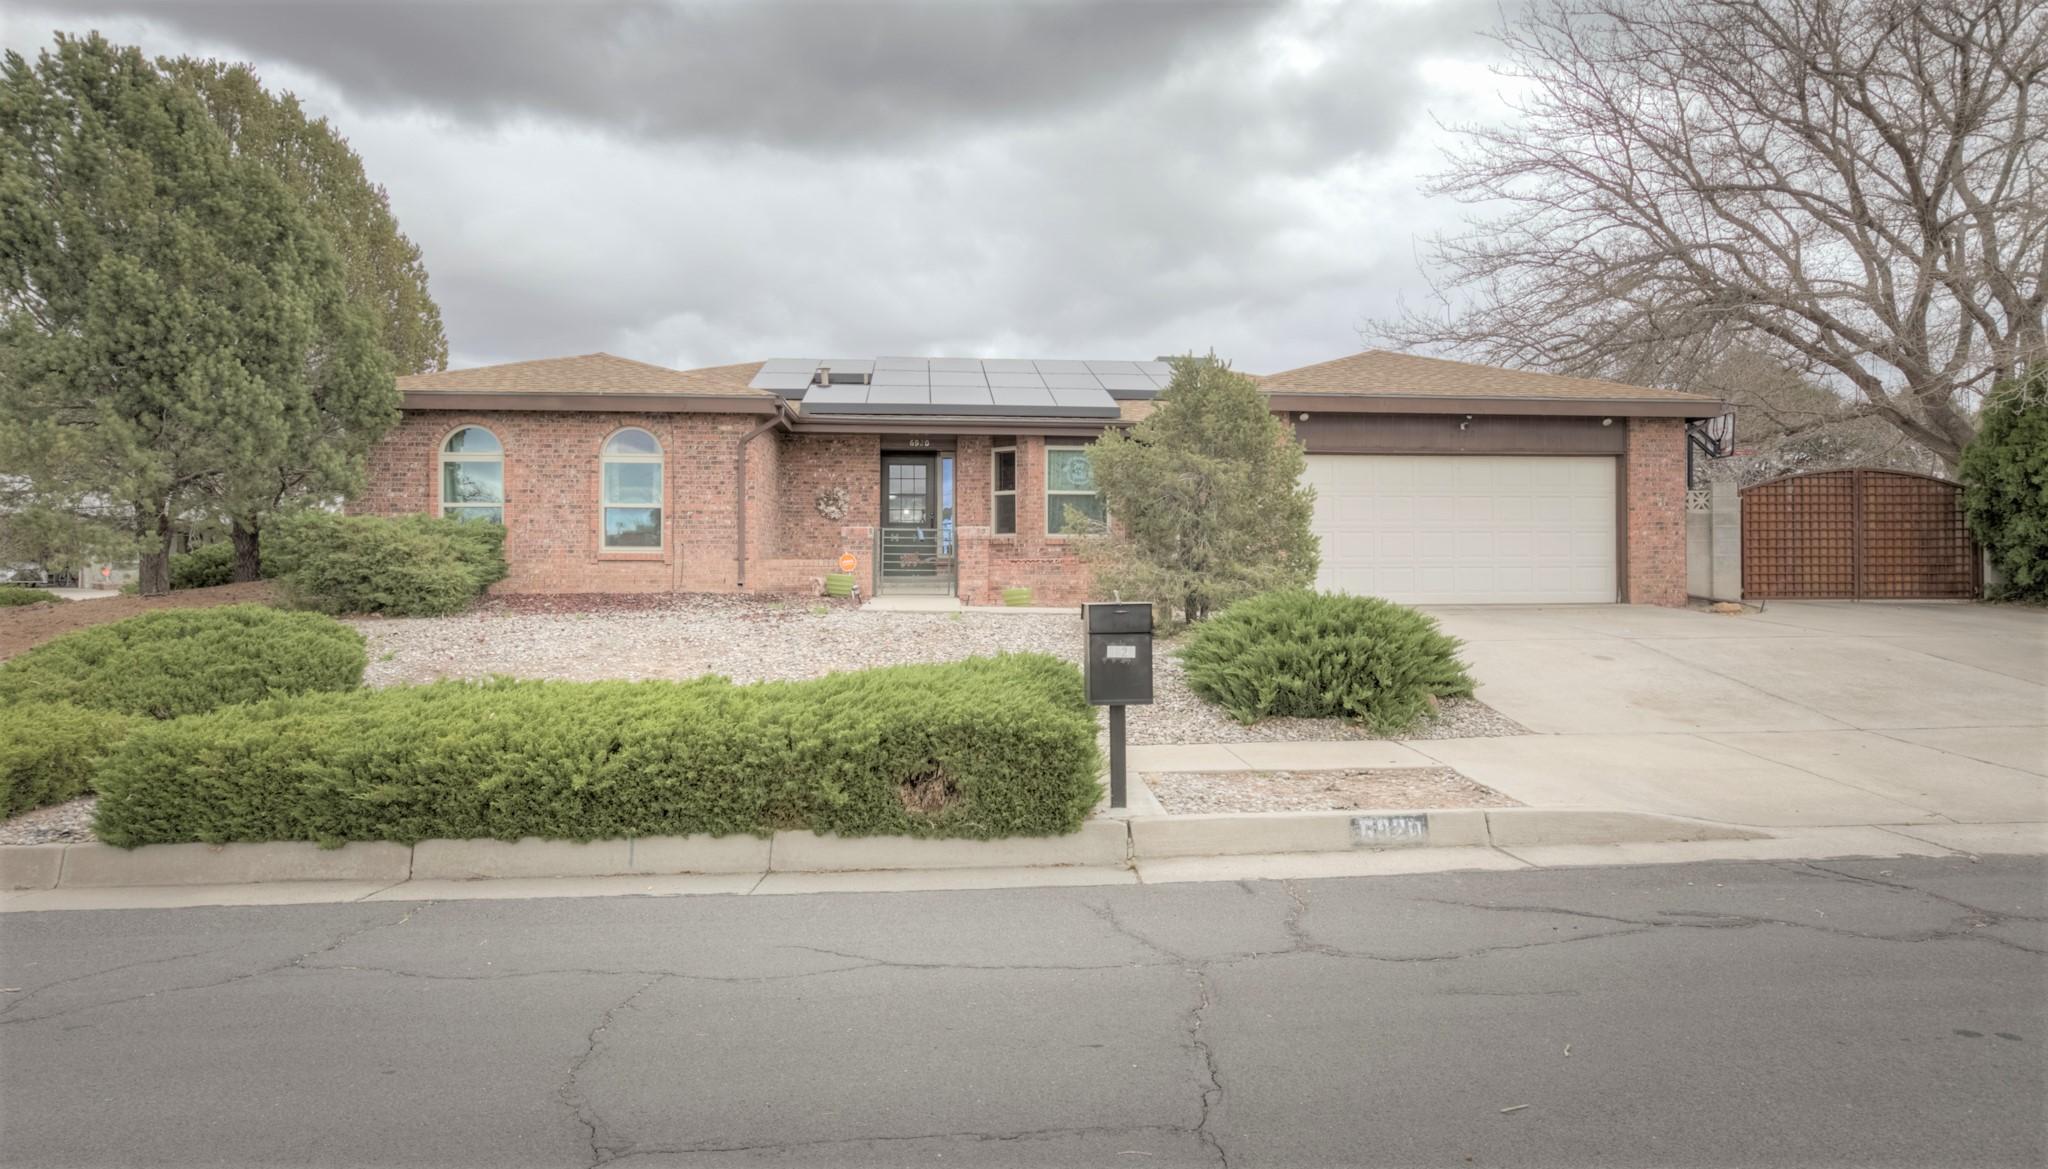 6920 CHERRY HILLS Place NE, Albuquerque, NM 87111 - Albuquerque, NM real estate listing